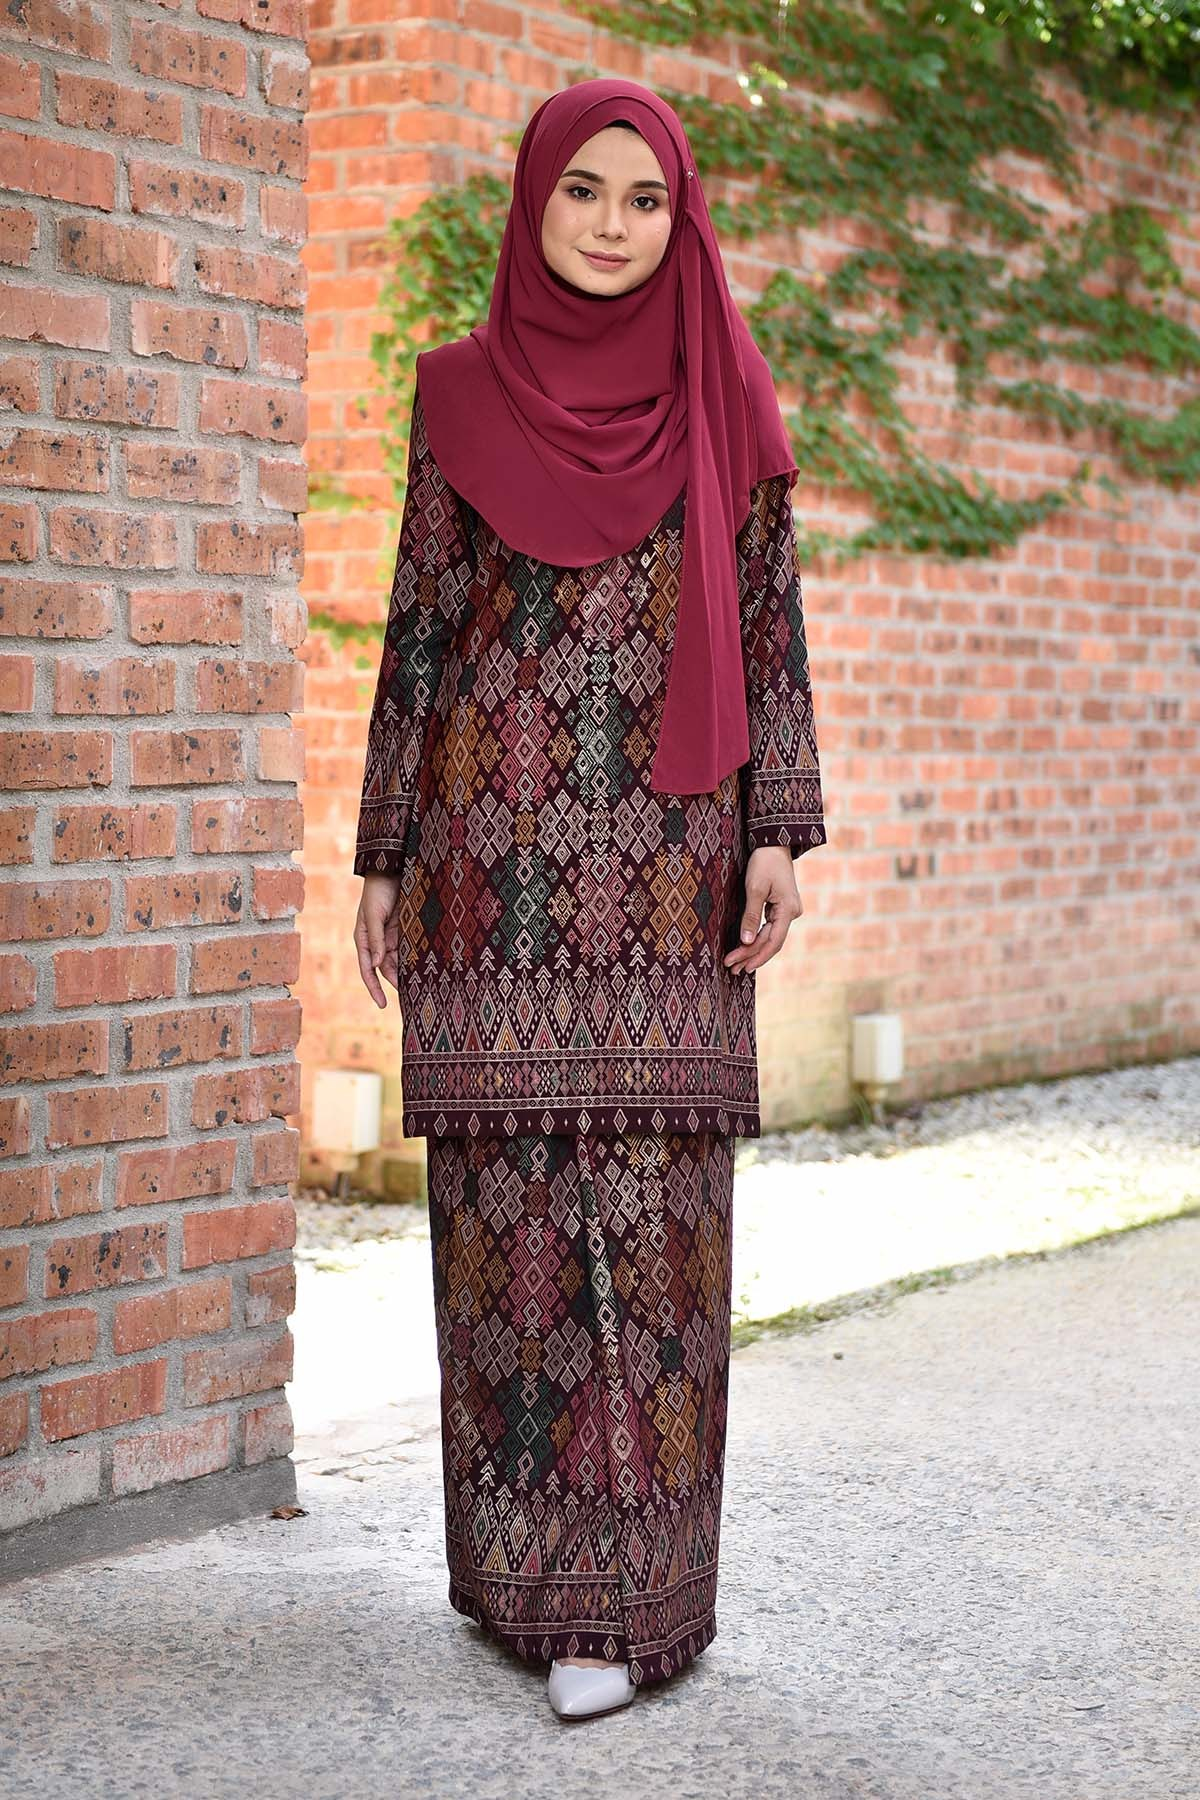 Bentuk Seragam Bridesmaid Hijab Qwdq Baju Kurung songket Luella Deep Maroon